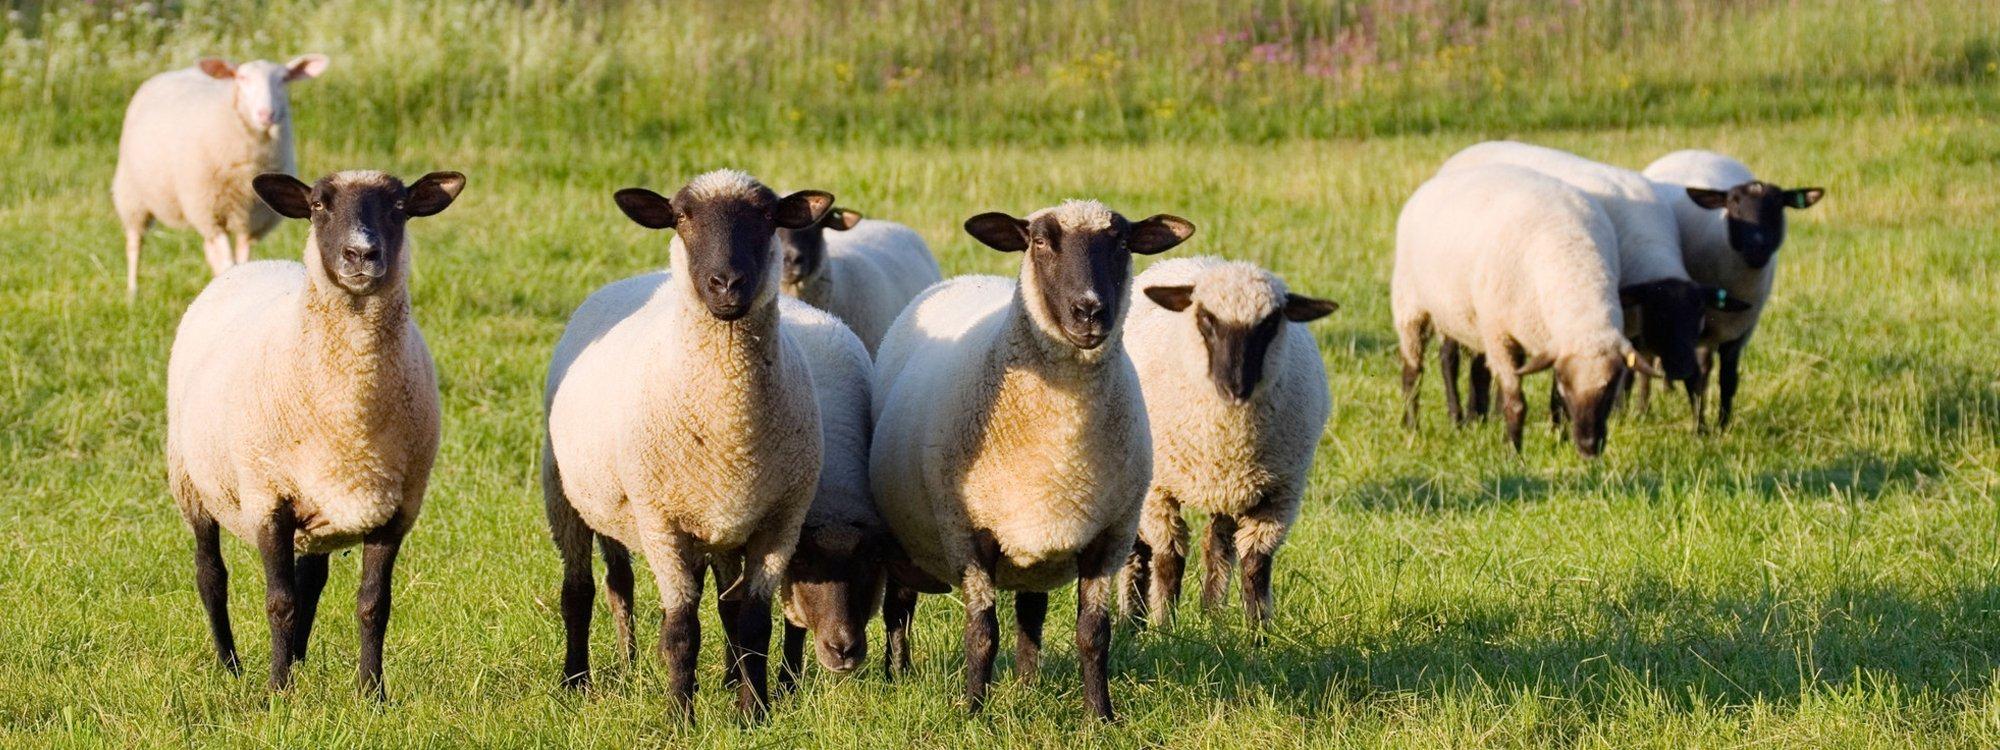 Farm animal treatments